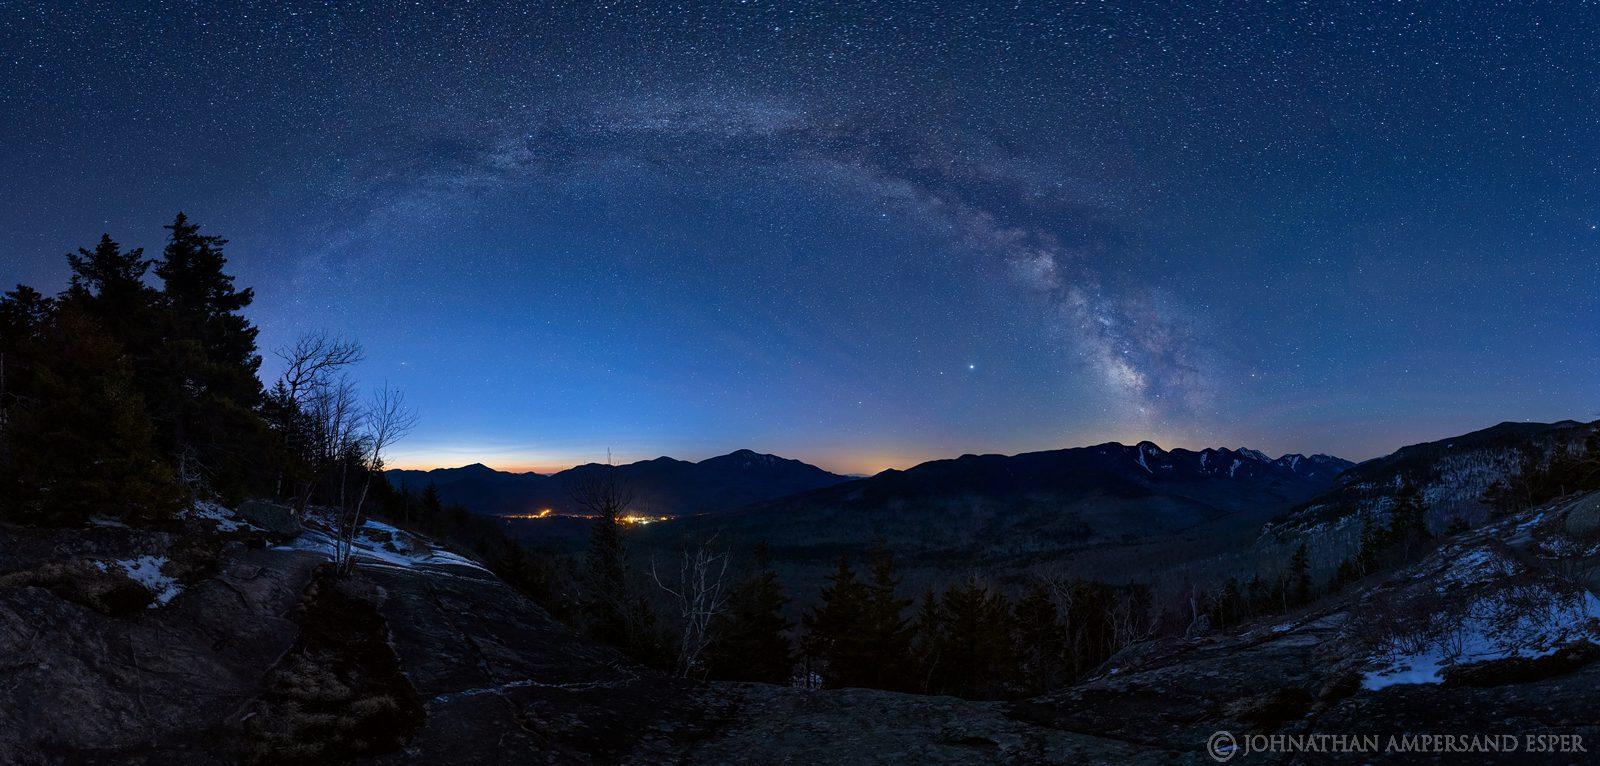 Milky Way,The Brothers,Big Slide Mt,night,stars,Great Range,April,2020,Keene Valley,Giant Mt,Hurricane Mt,panorama,